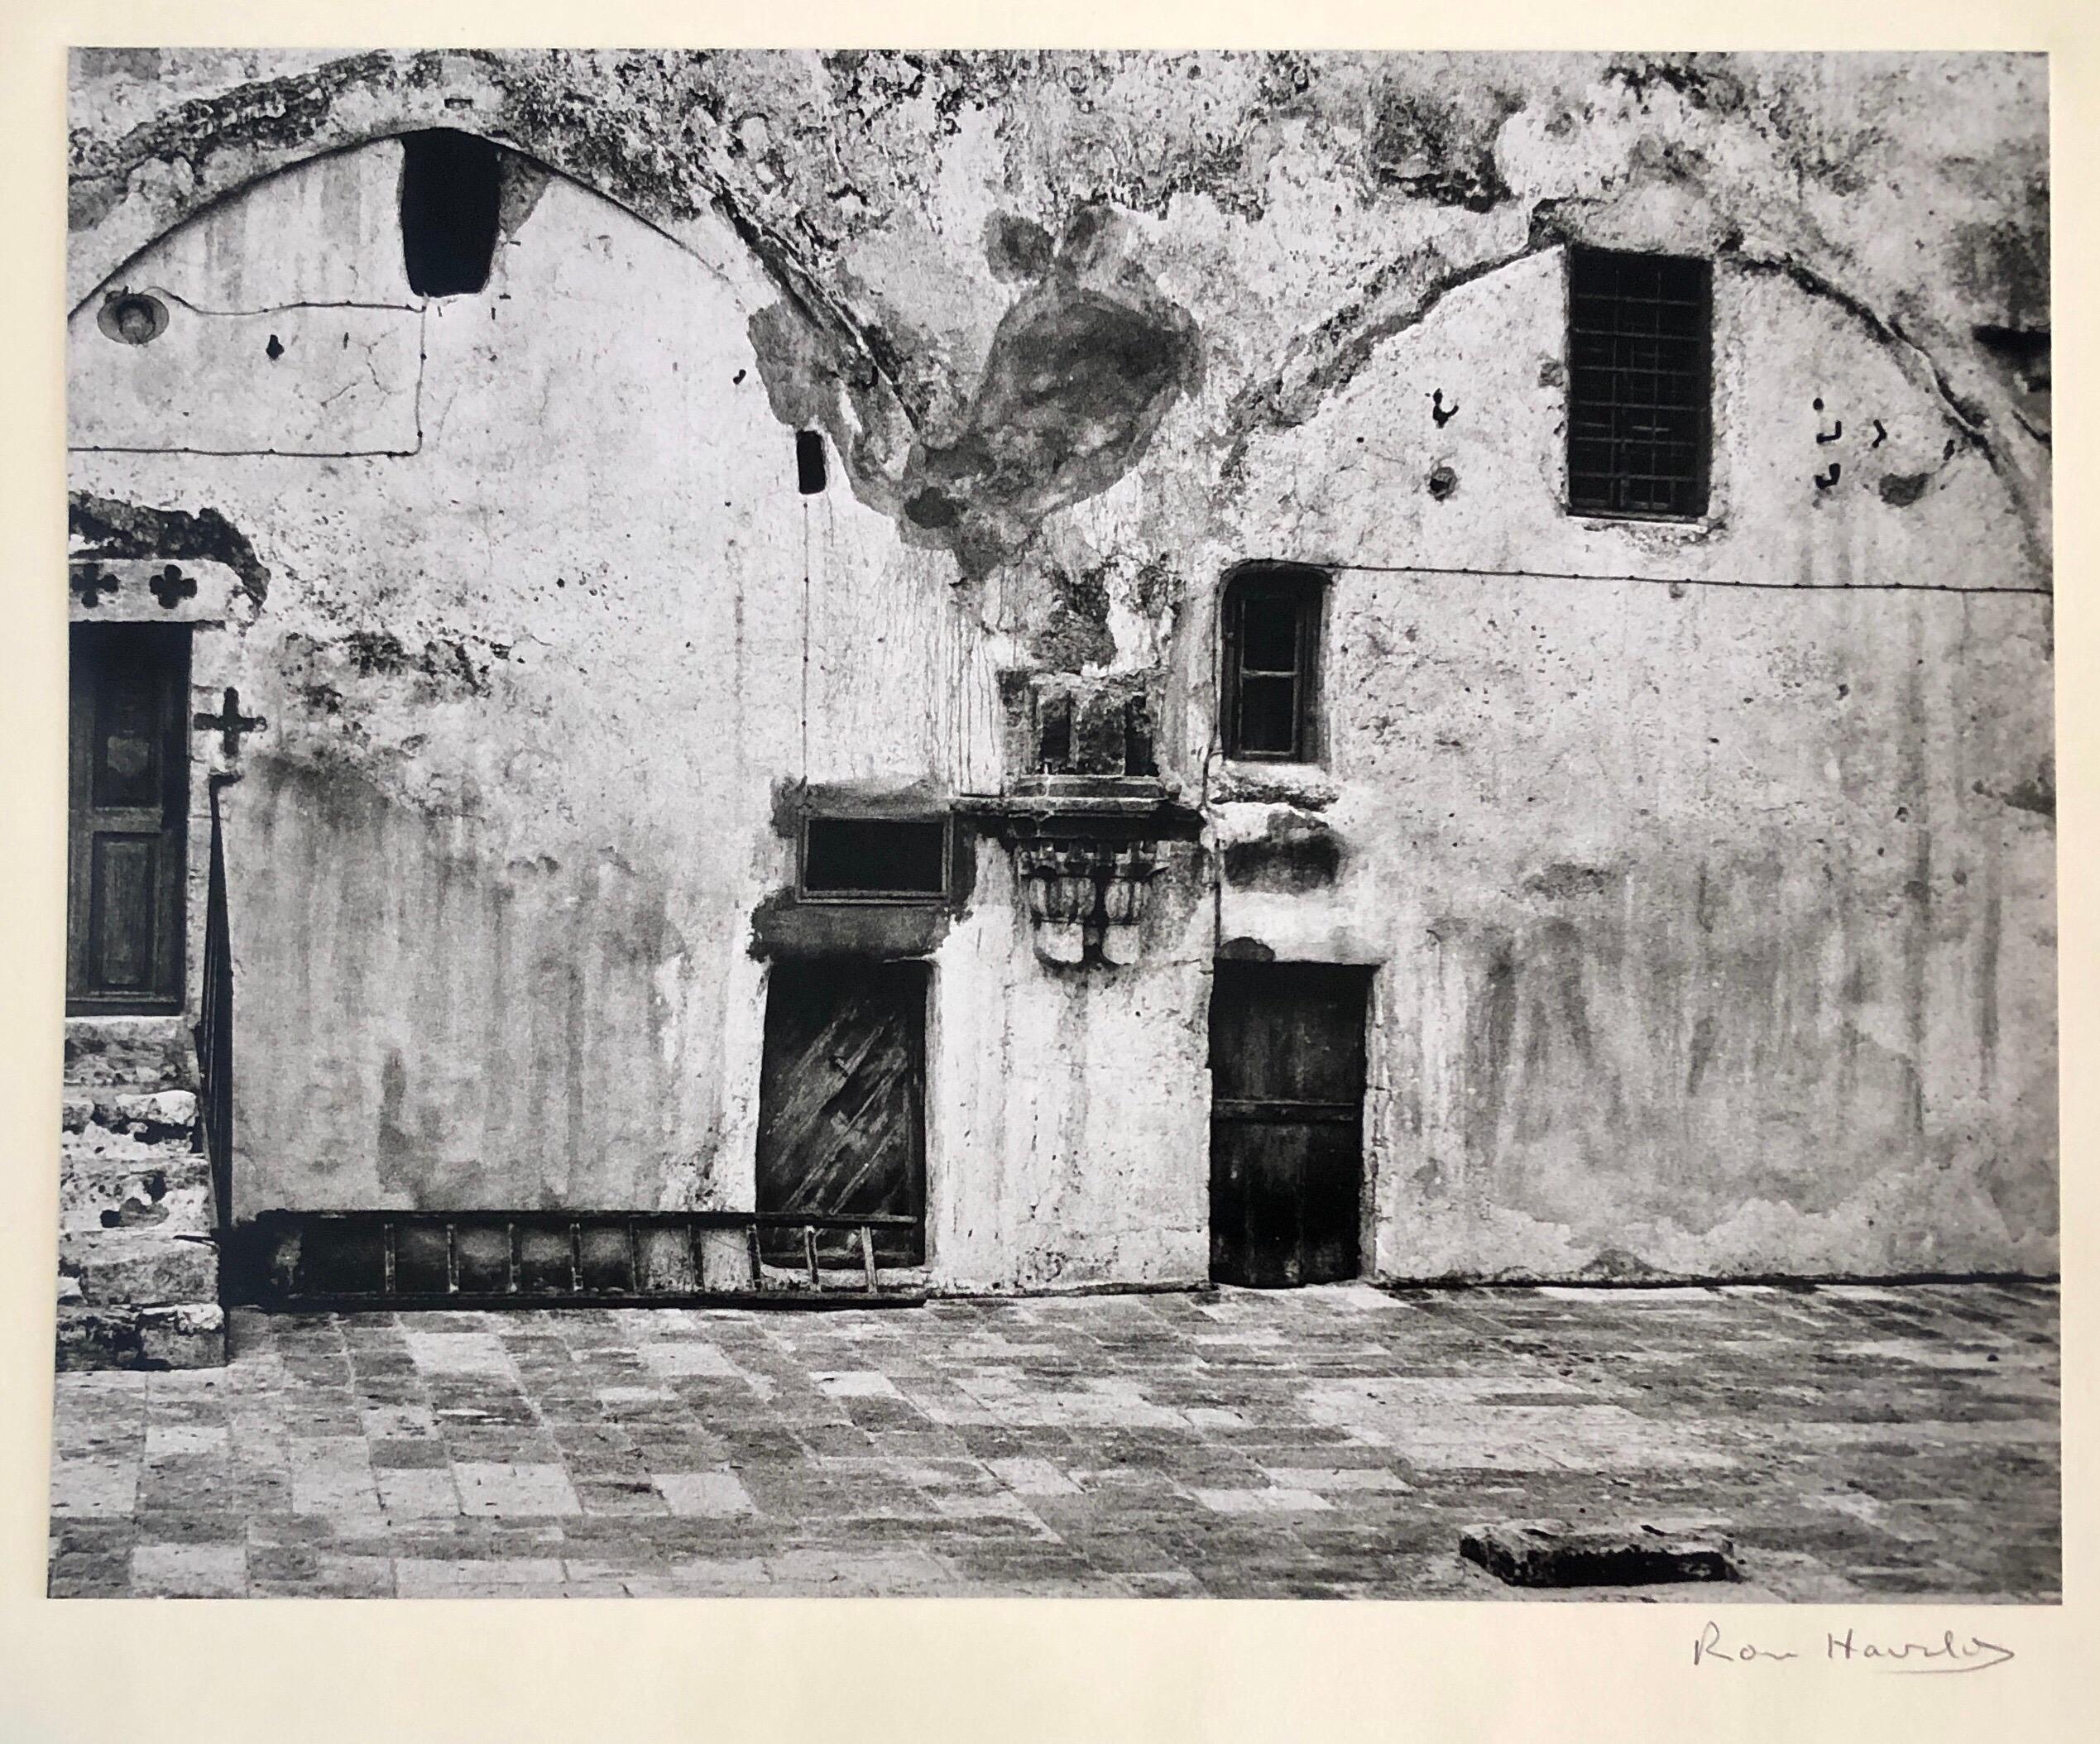 Vintage Silver Gelatin Photograph Wallscape, Jerusalem Architectural Photo